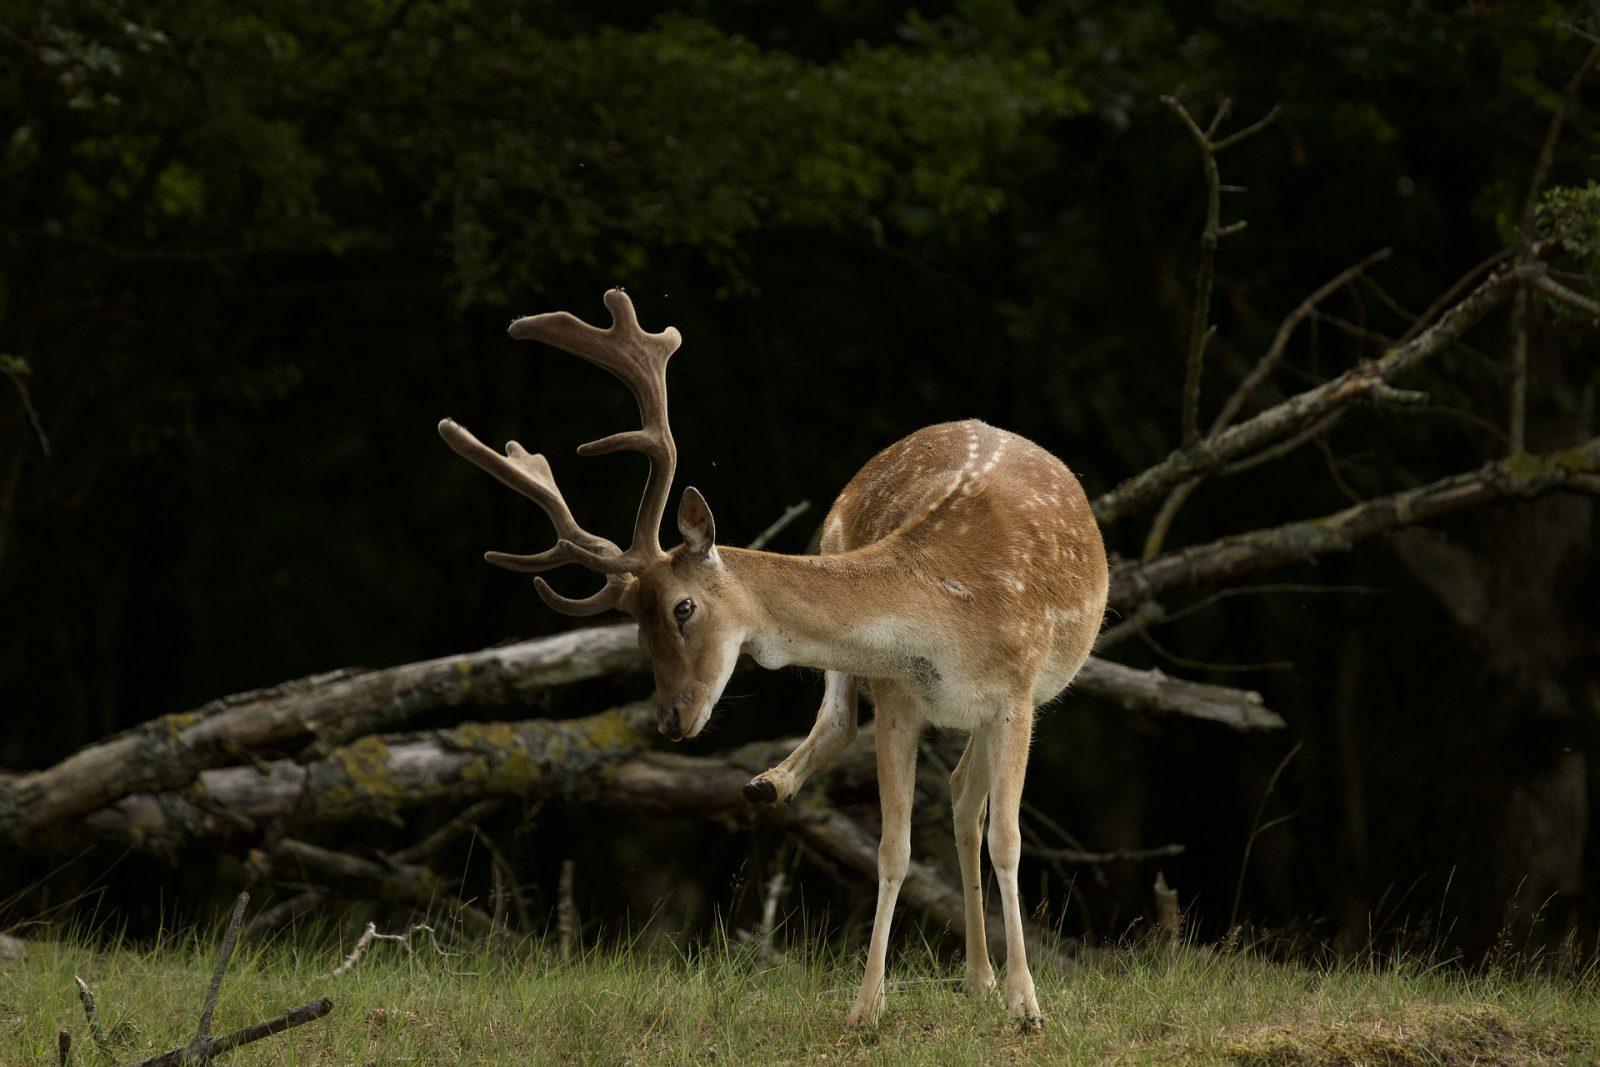 How to Protect Trees From Deer Rub Buck Rubbing On Tree #BuckRub #AntlerRub #DeerRub #DeerDamage #TreeTrunkDamage #ProtectTrees #TreeDamage #TreeWrap